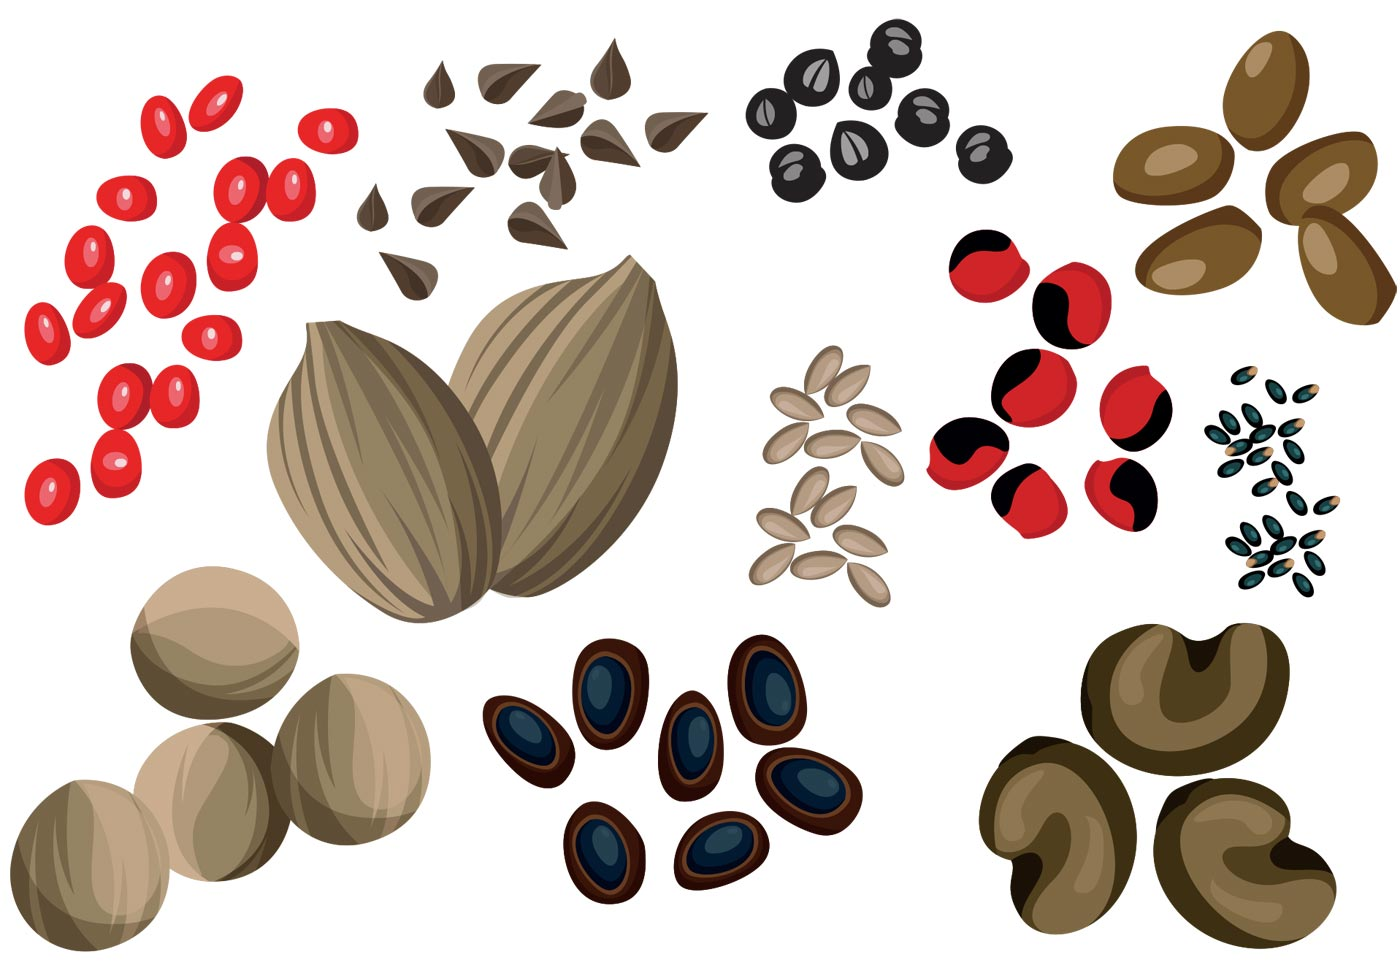 томатов слово семена в картинках найдено туле